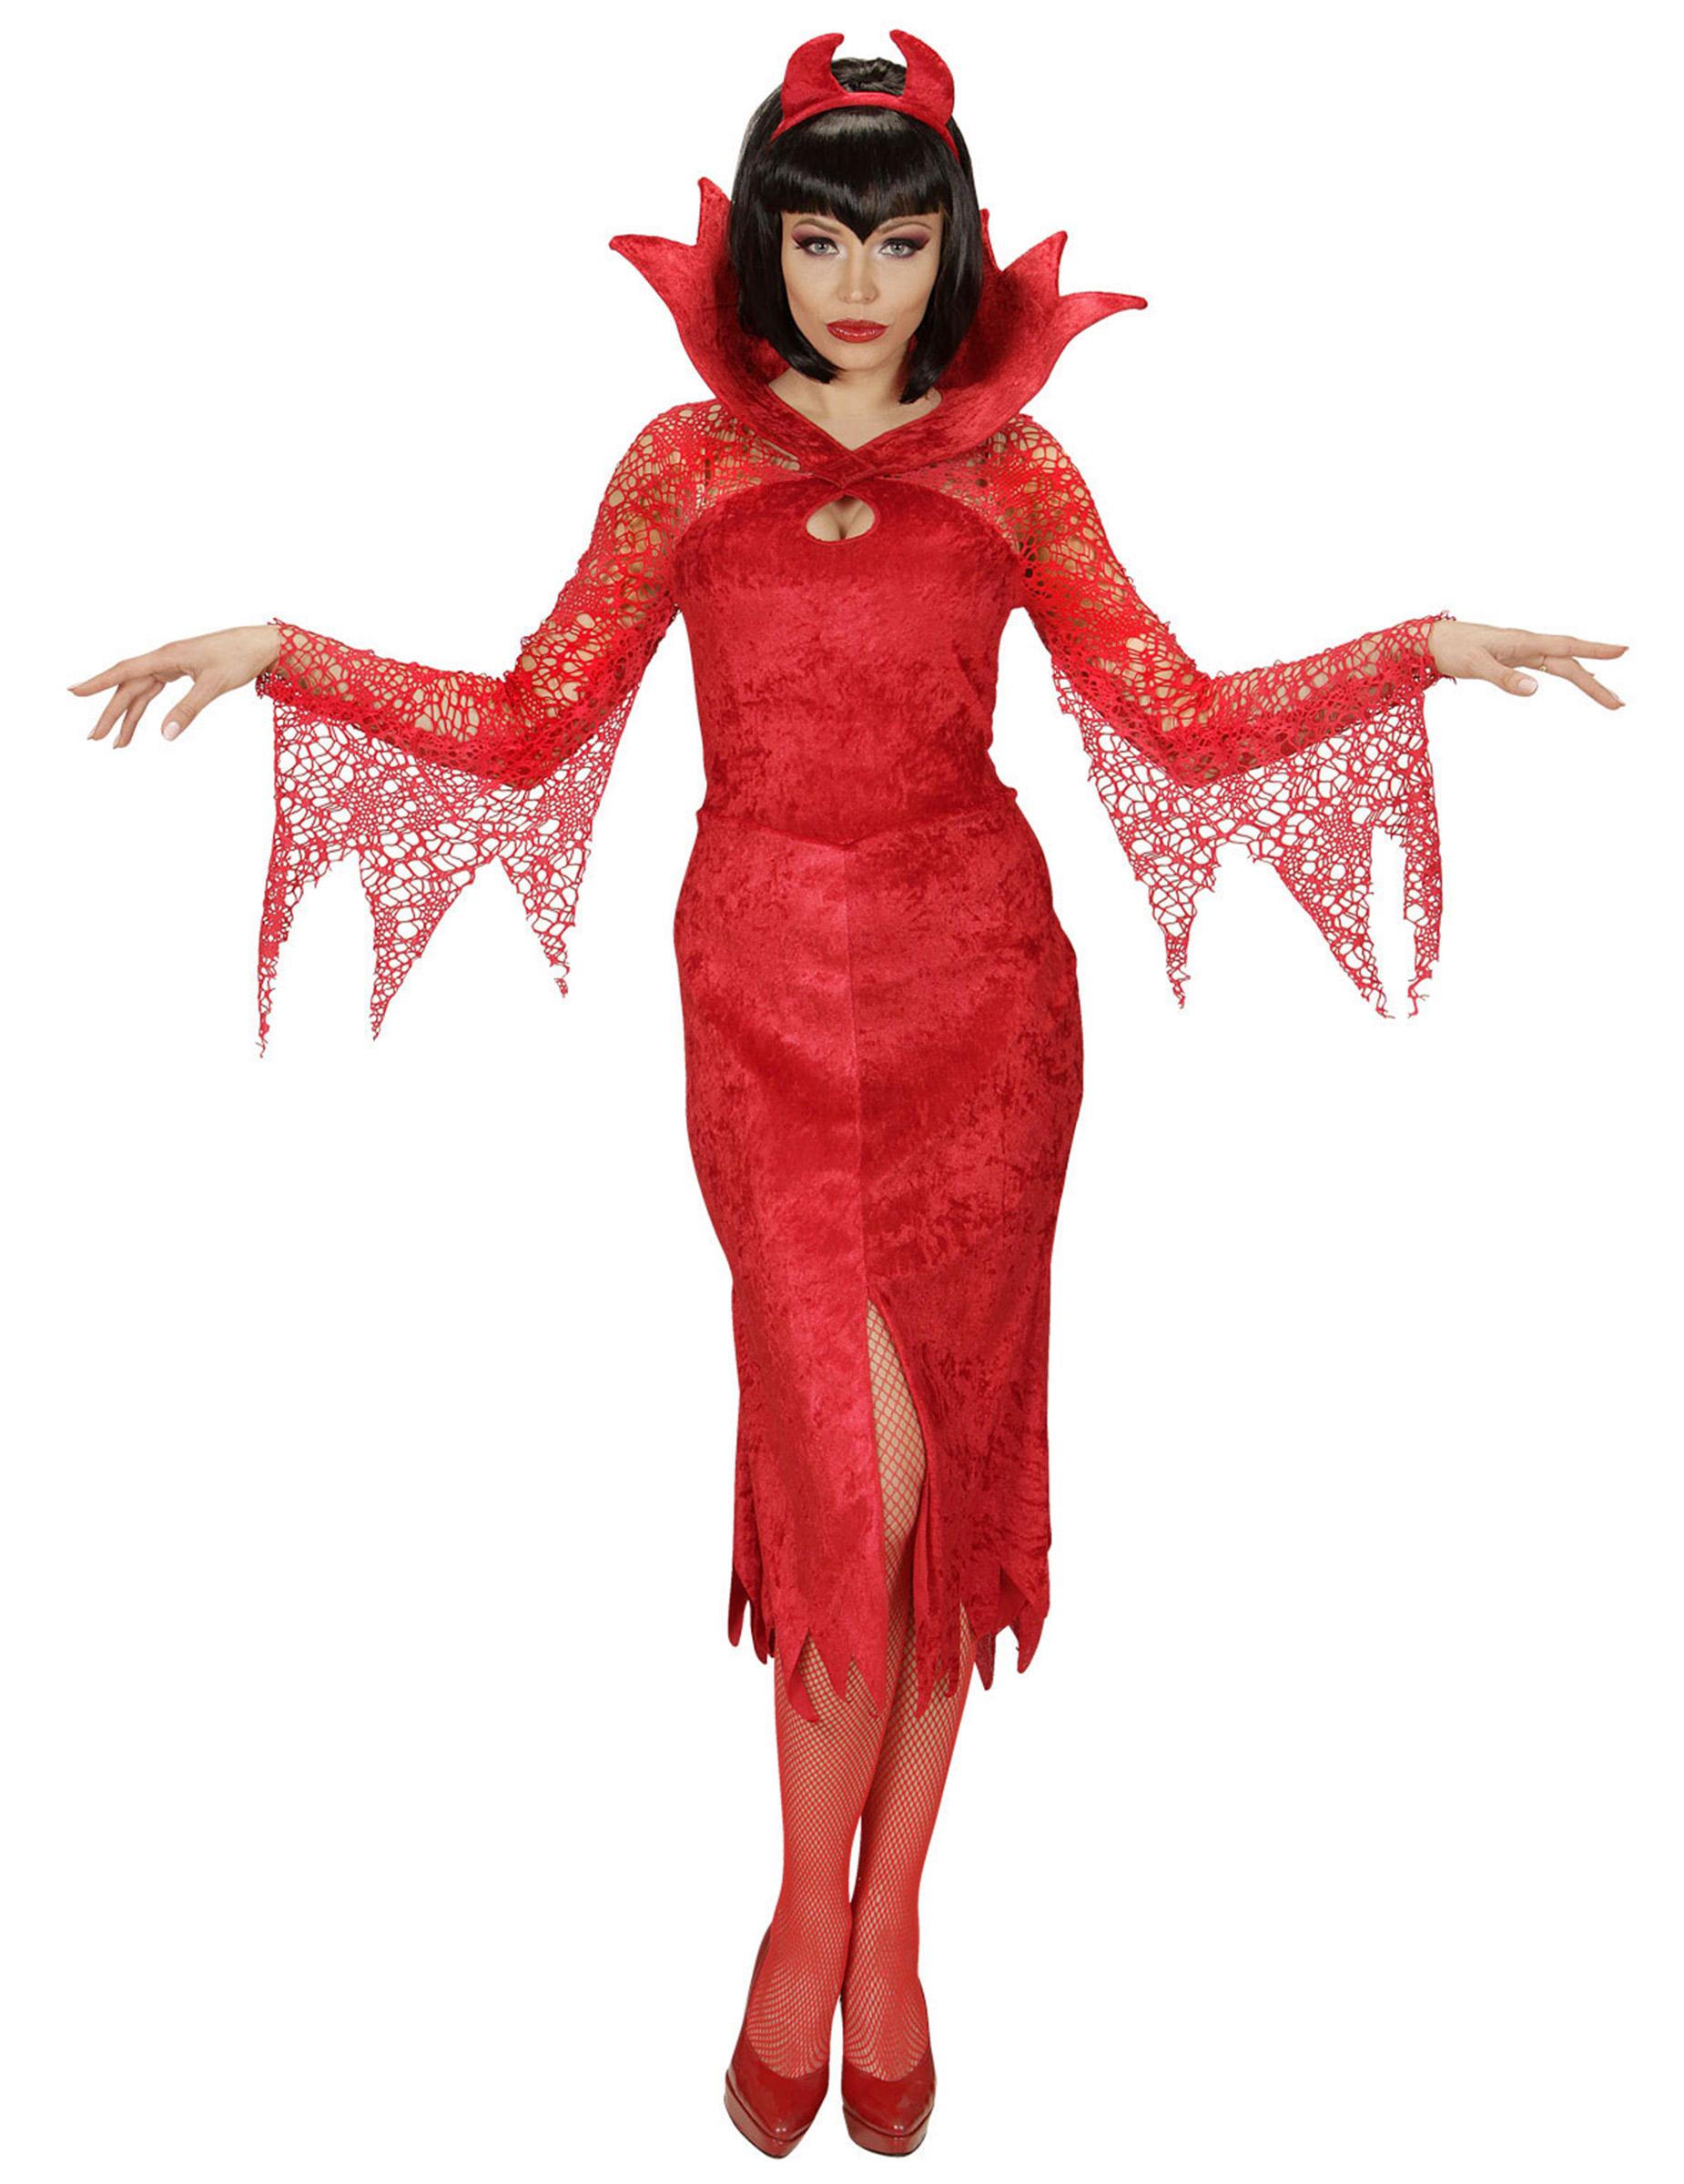 Augenmasken Gesicht Maske Fasching Karneval Halloween Kostüm Teufel Teufelin